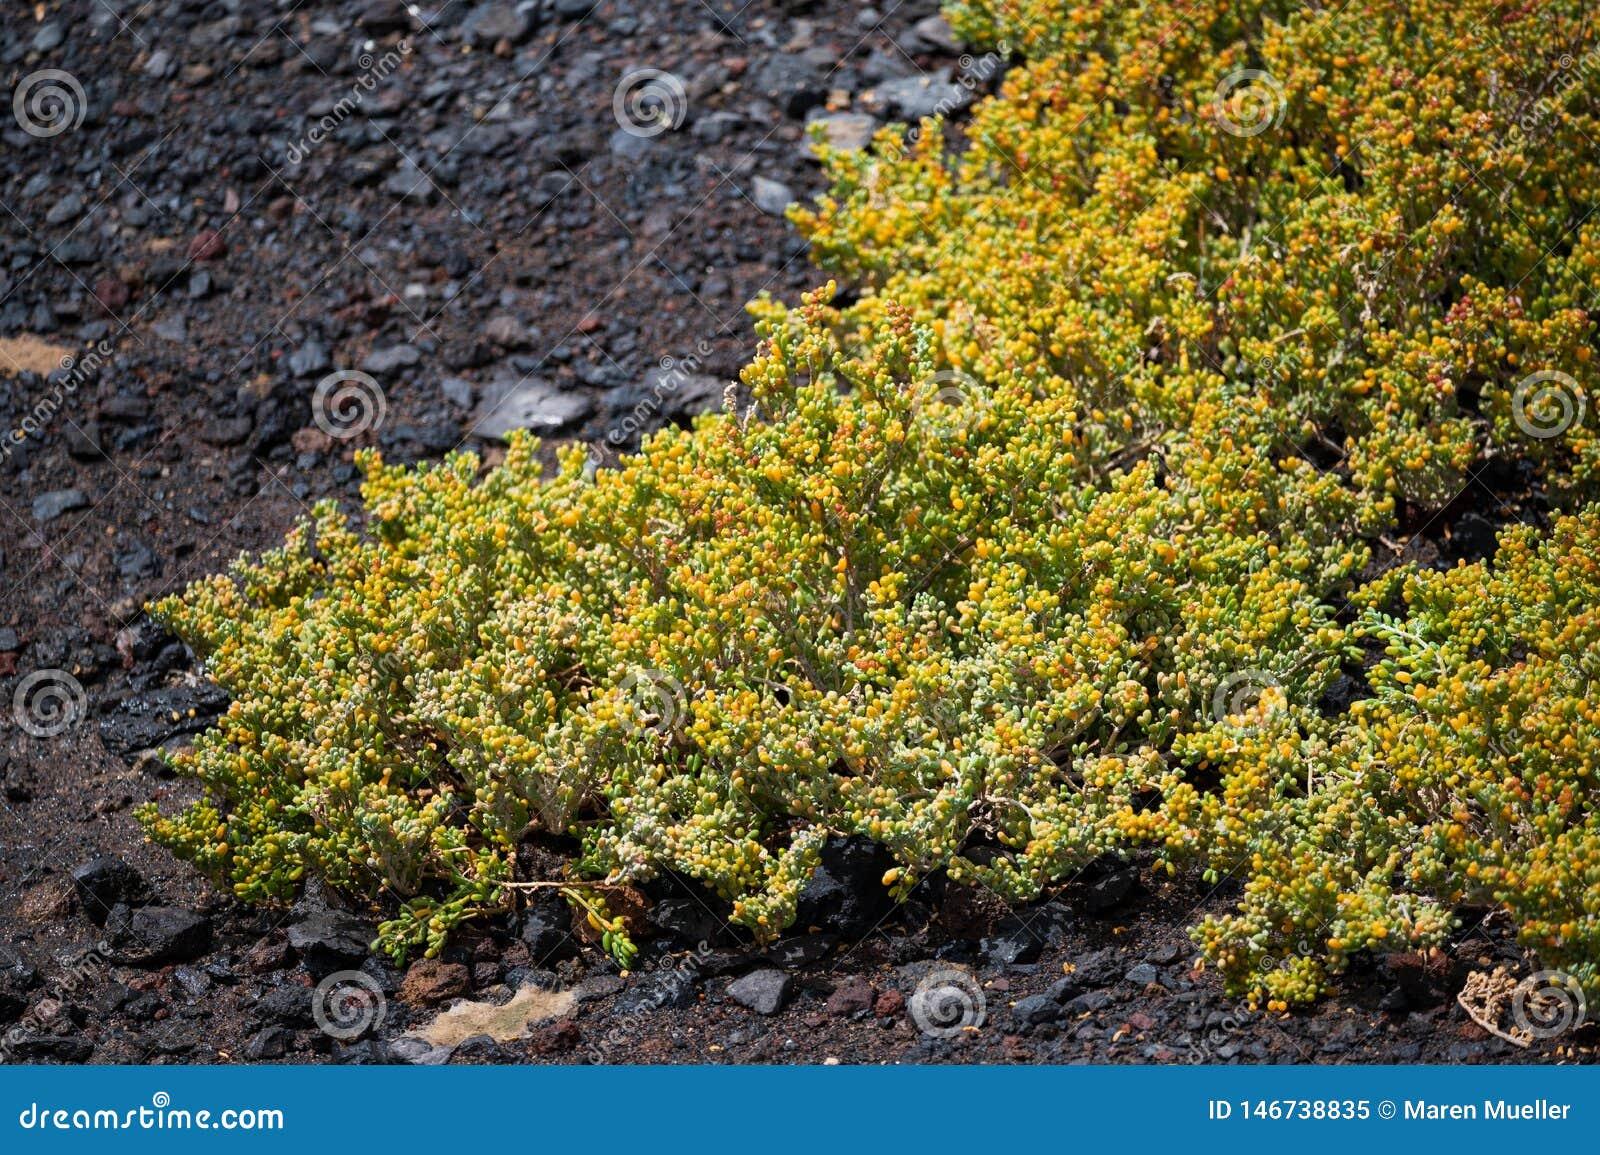 O nome científico desta planta é